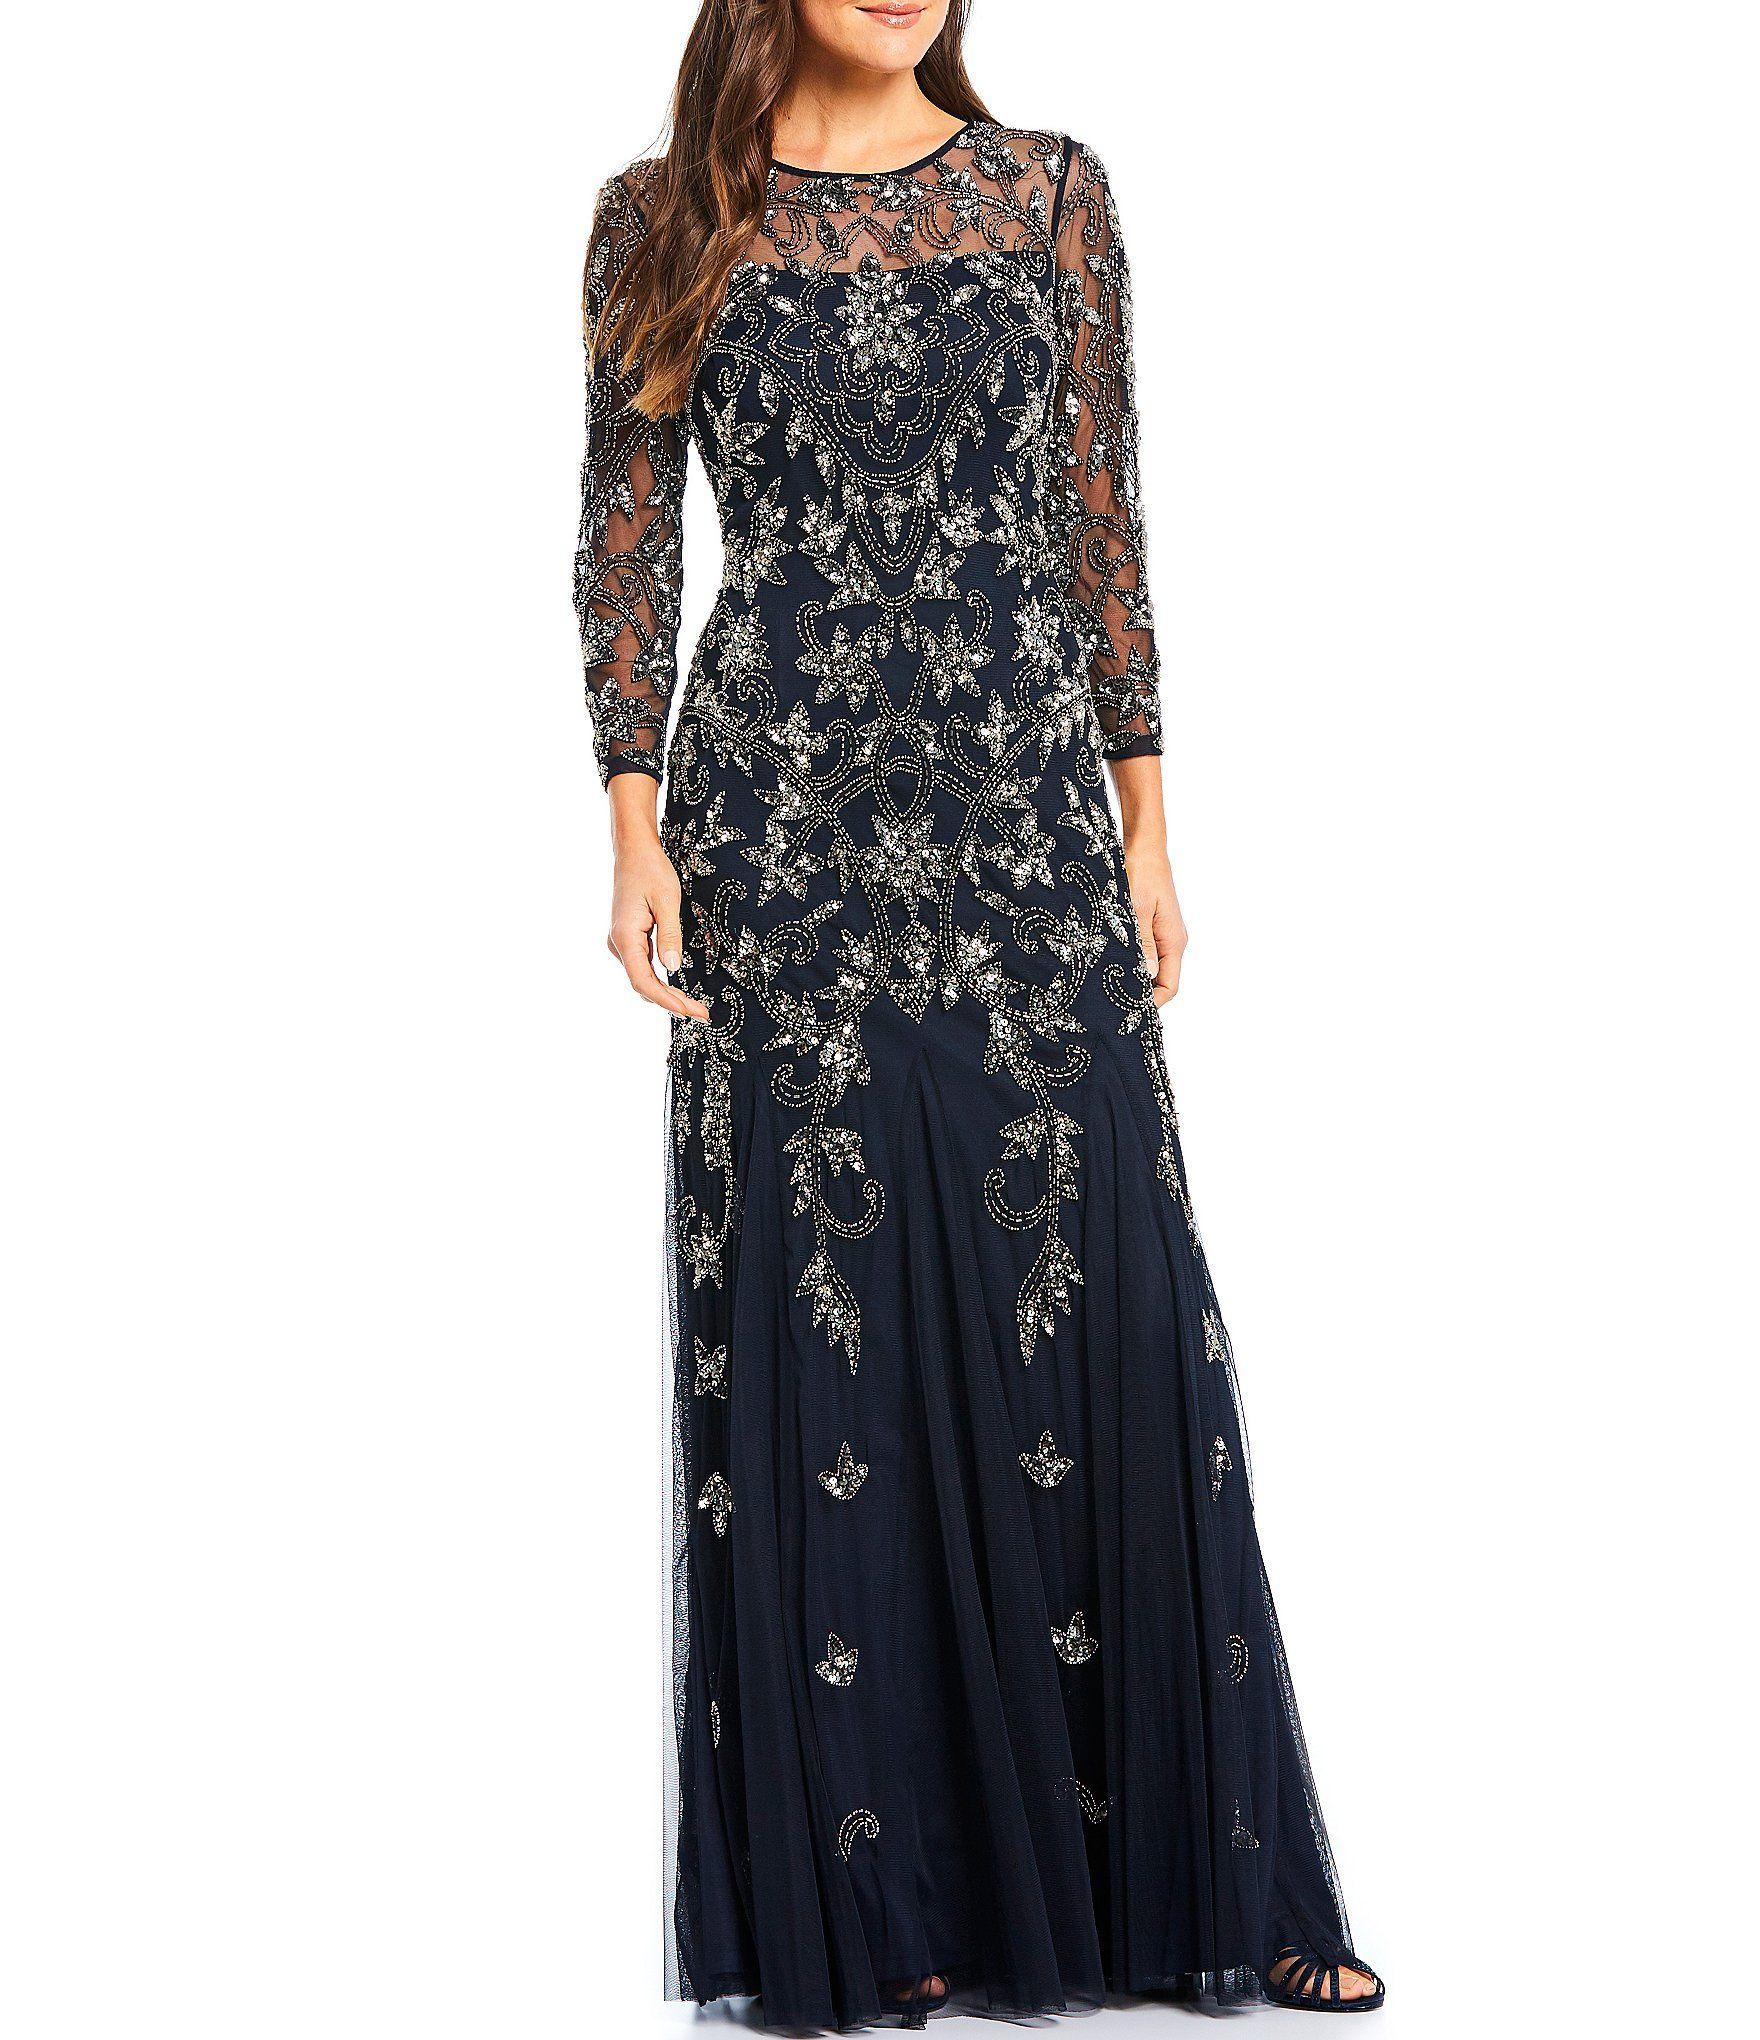 Adrianna Papell Beaded Illusion 3 4 Sleeve Gown Dillard S In 2021 Dillards Dress Wedding Dress Inspiration Women Wedding Guest Dresses [ 2040 x 1760 Pixel ]